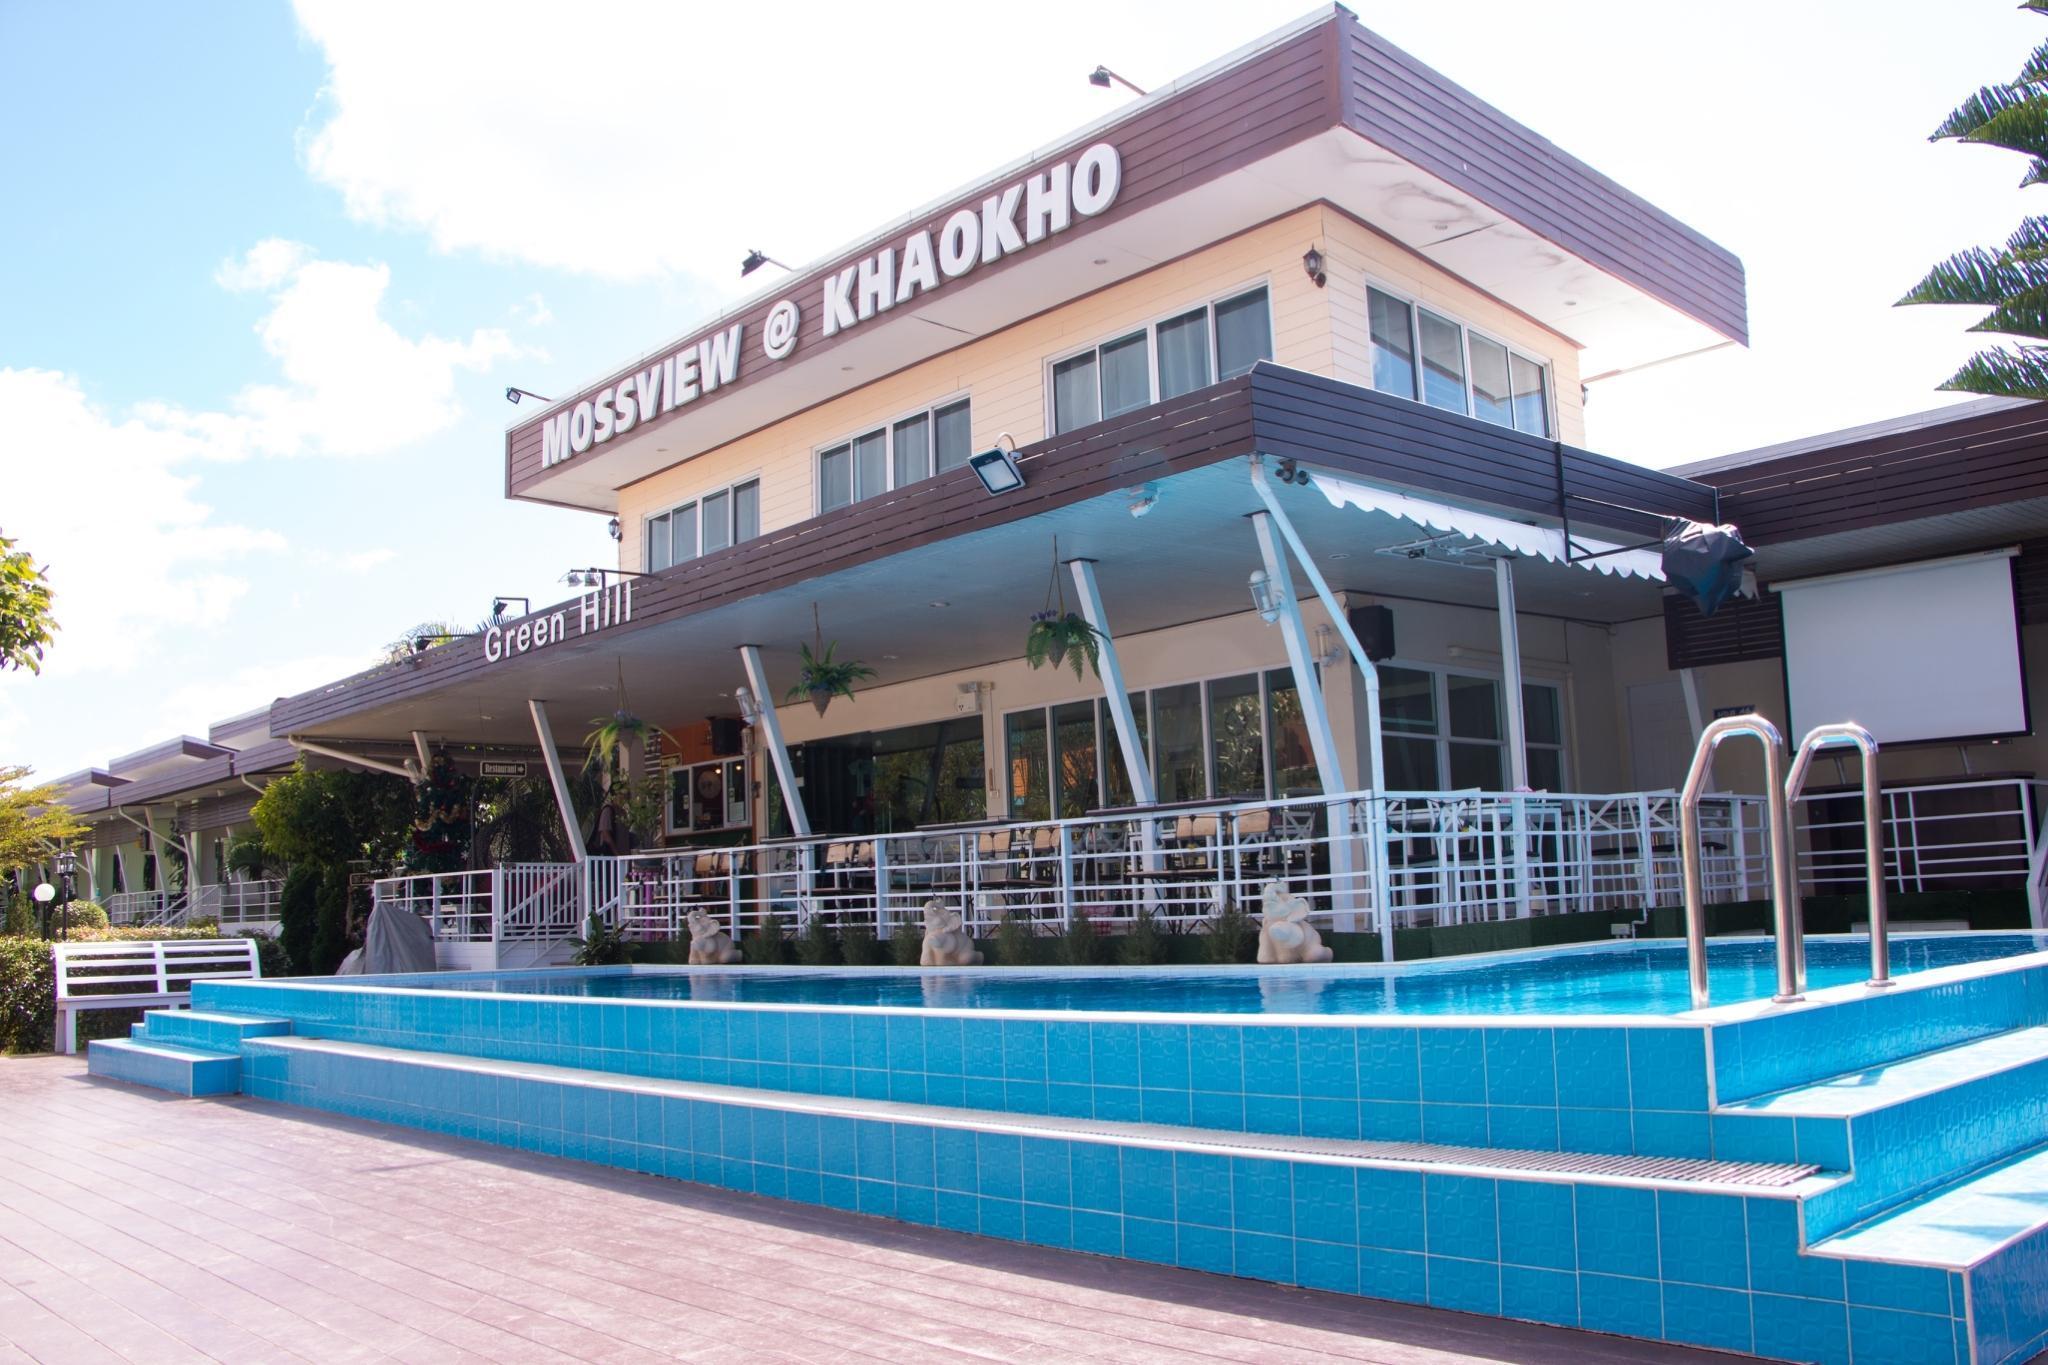 Mossview Resort 4